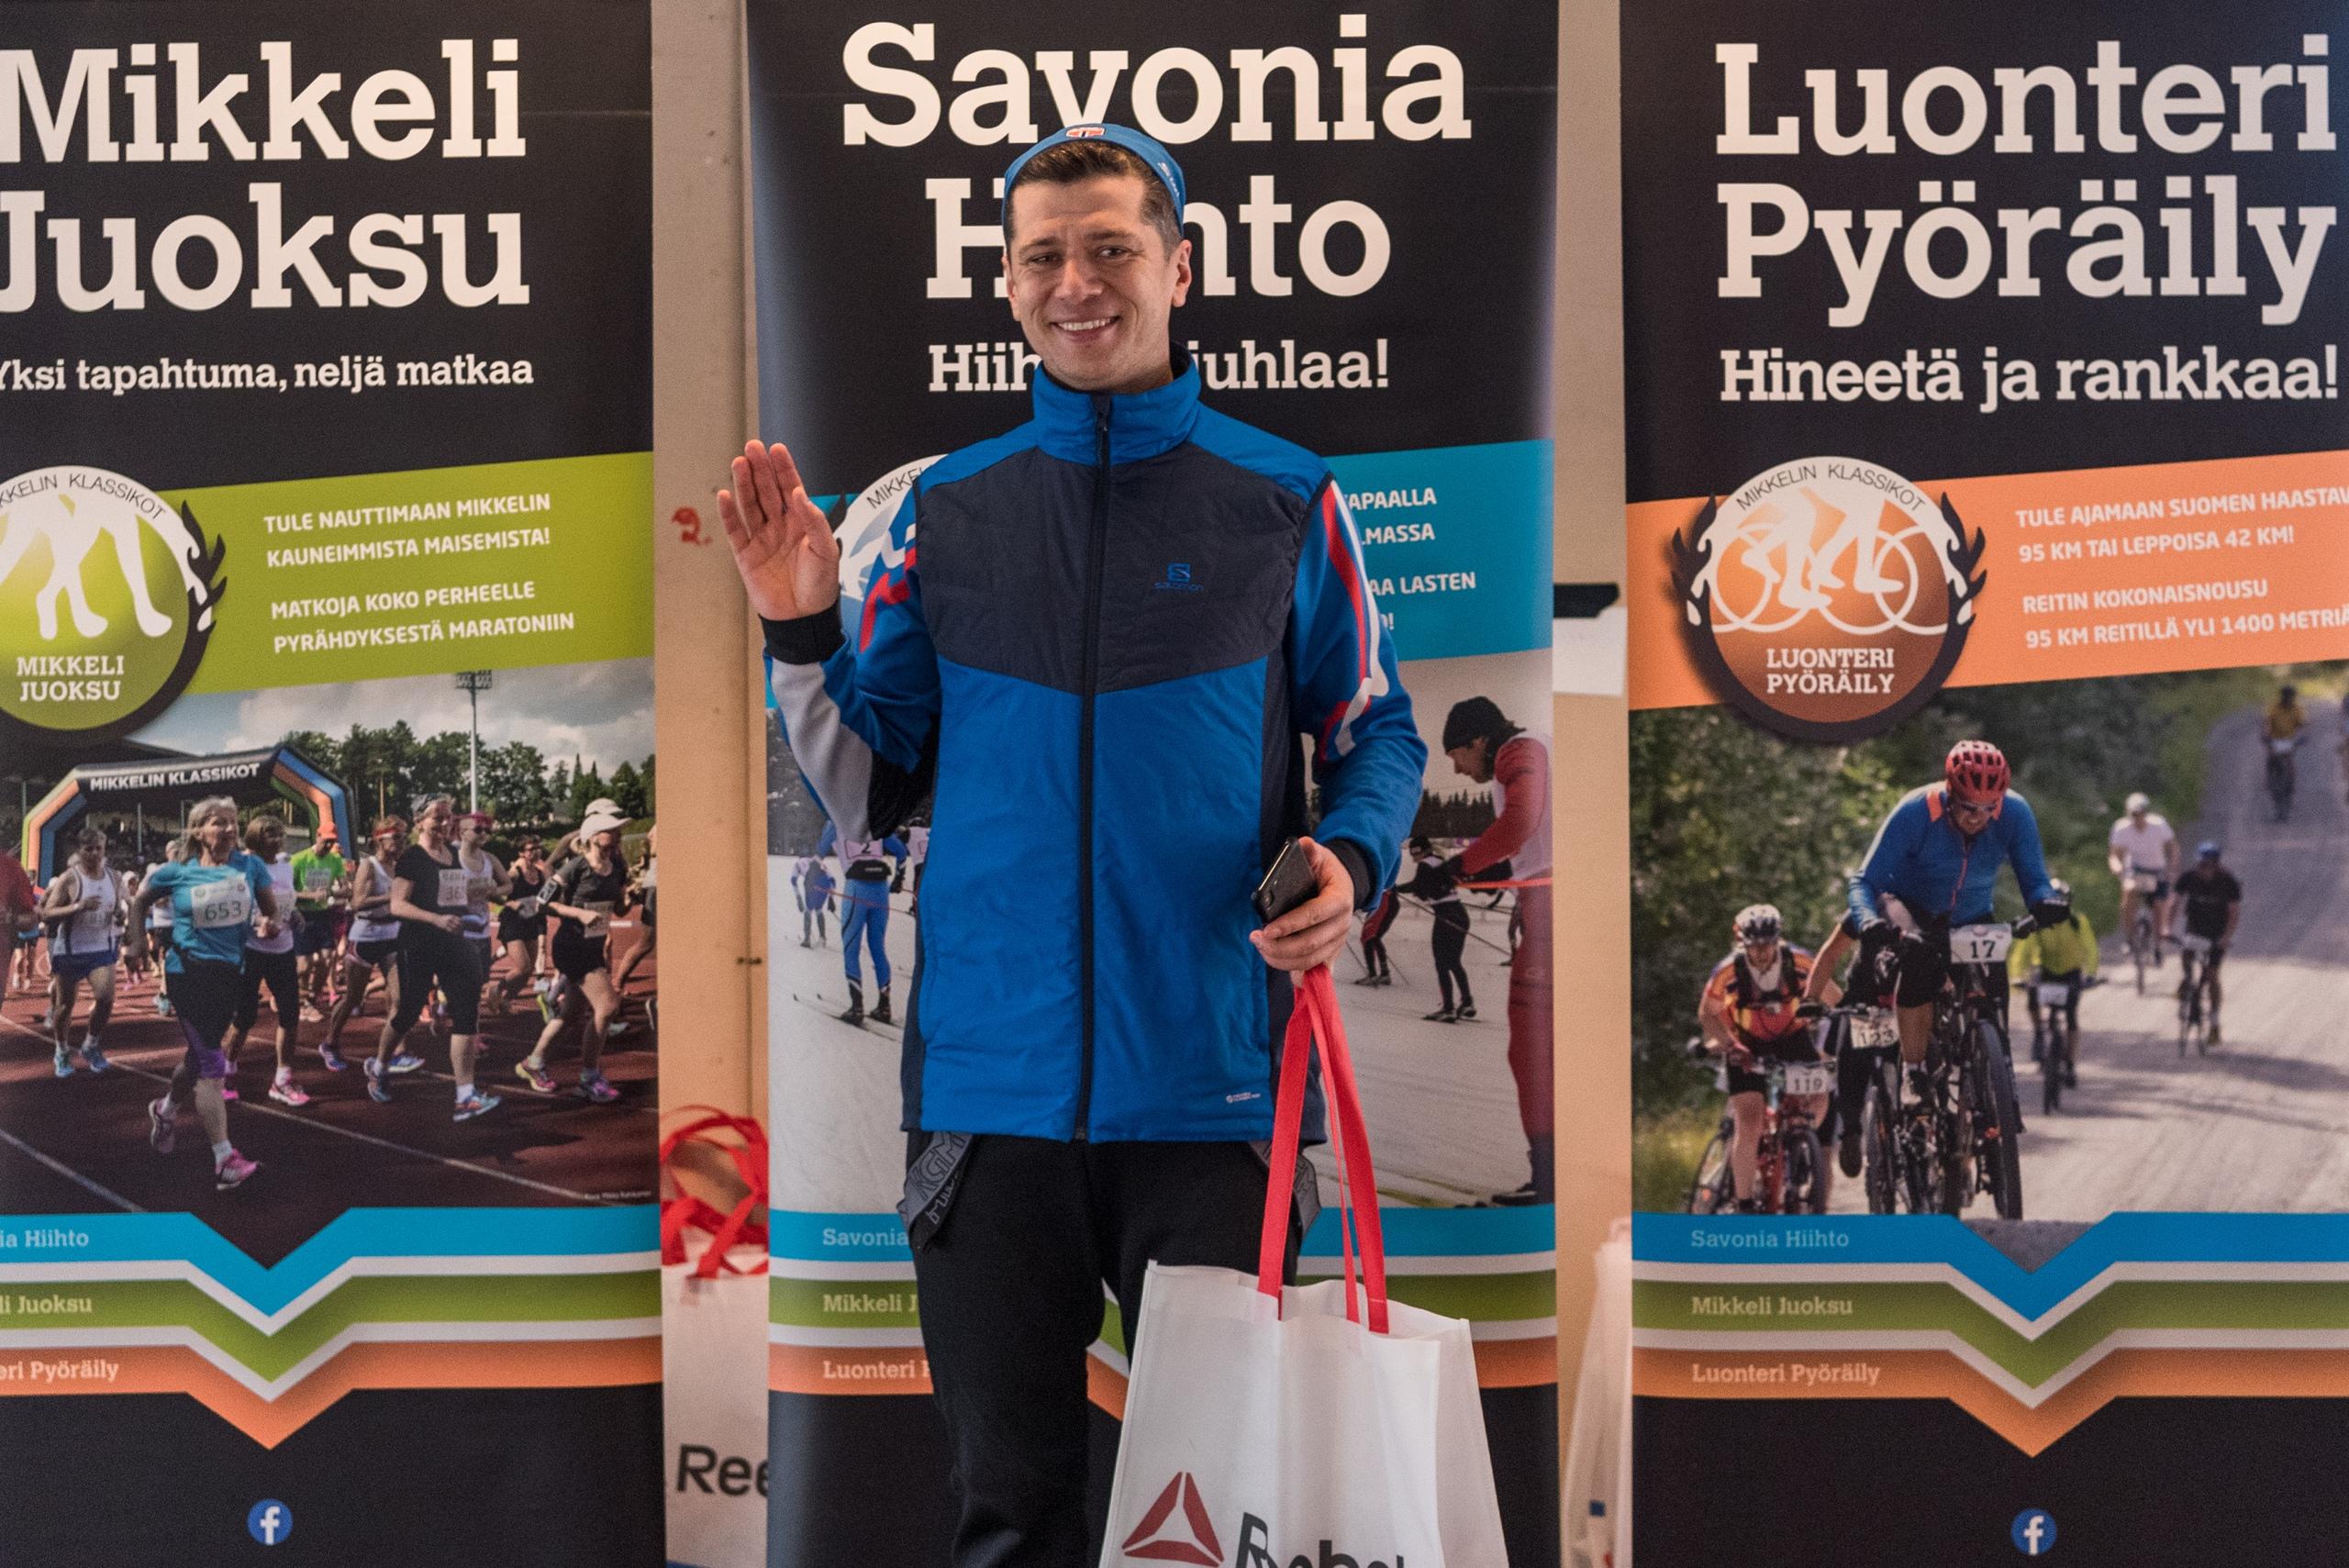 Savonia Hiihto на старте